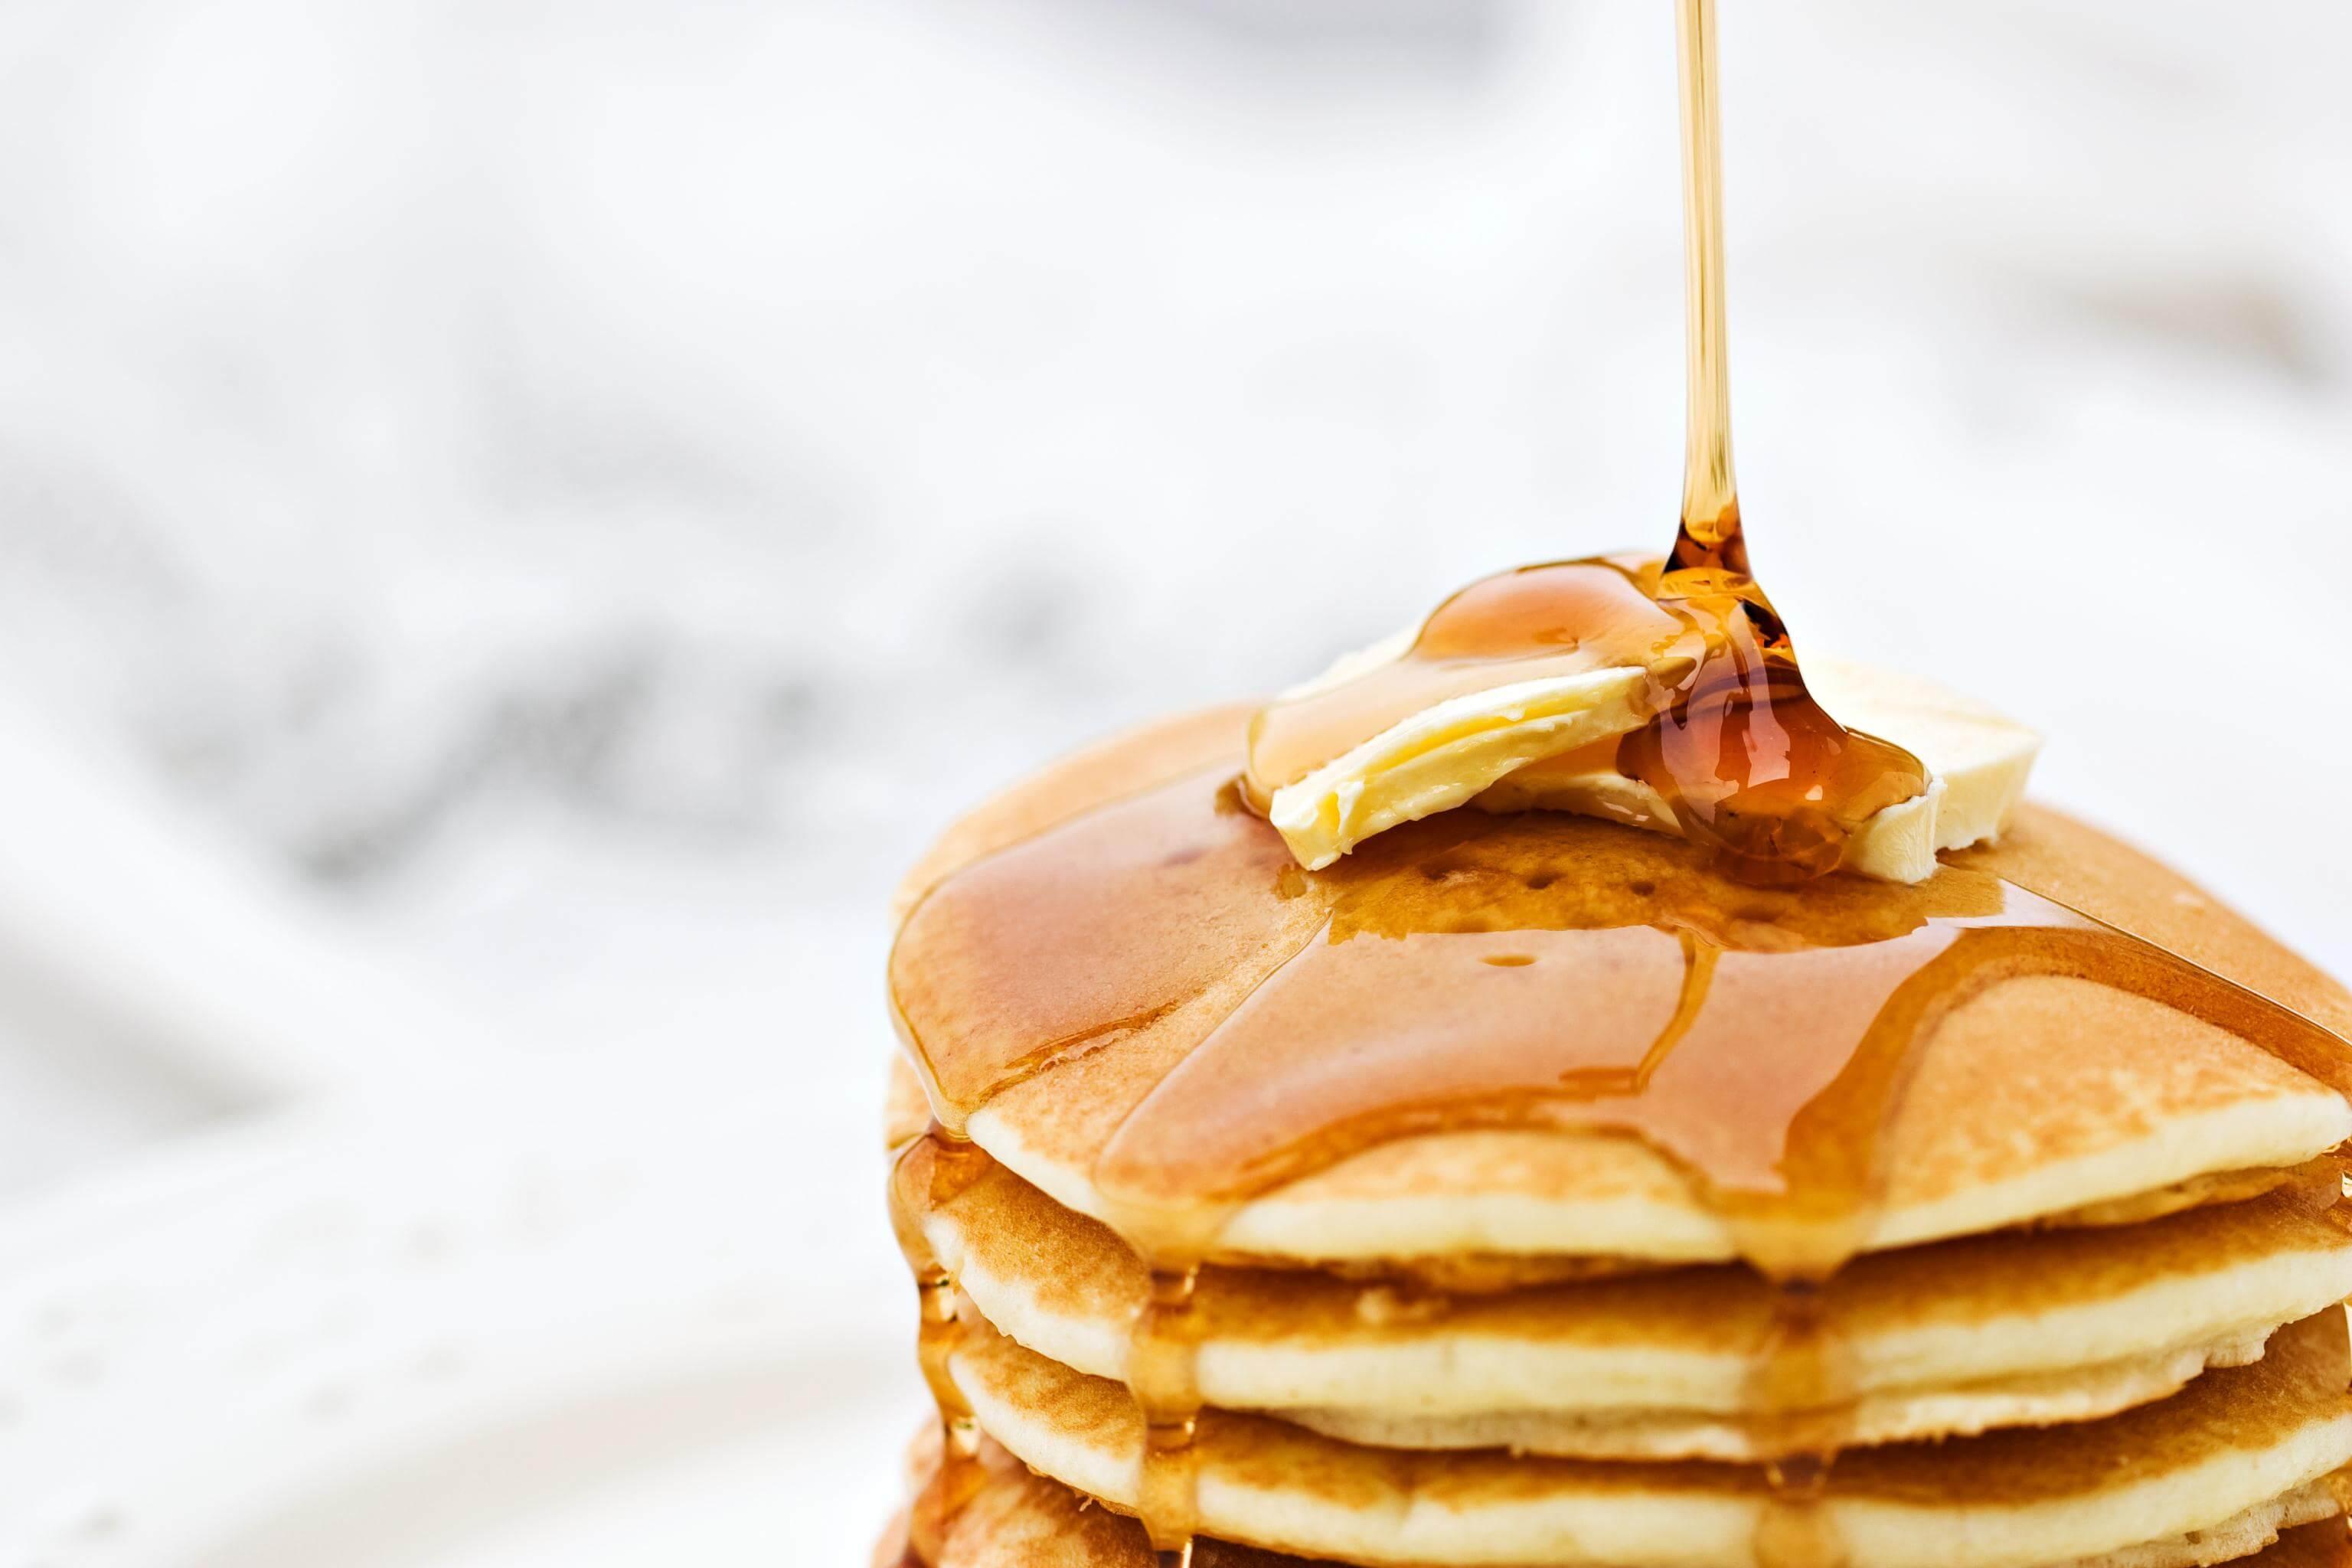 pancakes_carnival_oil_honey_food_stuff_hd-wallpaper-359839